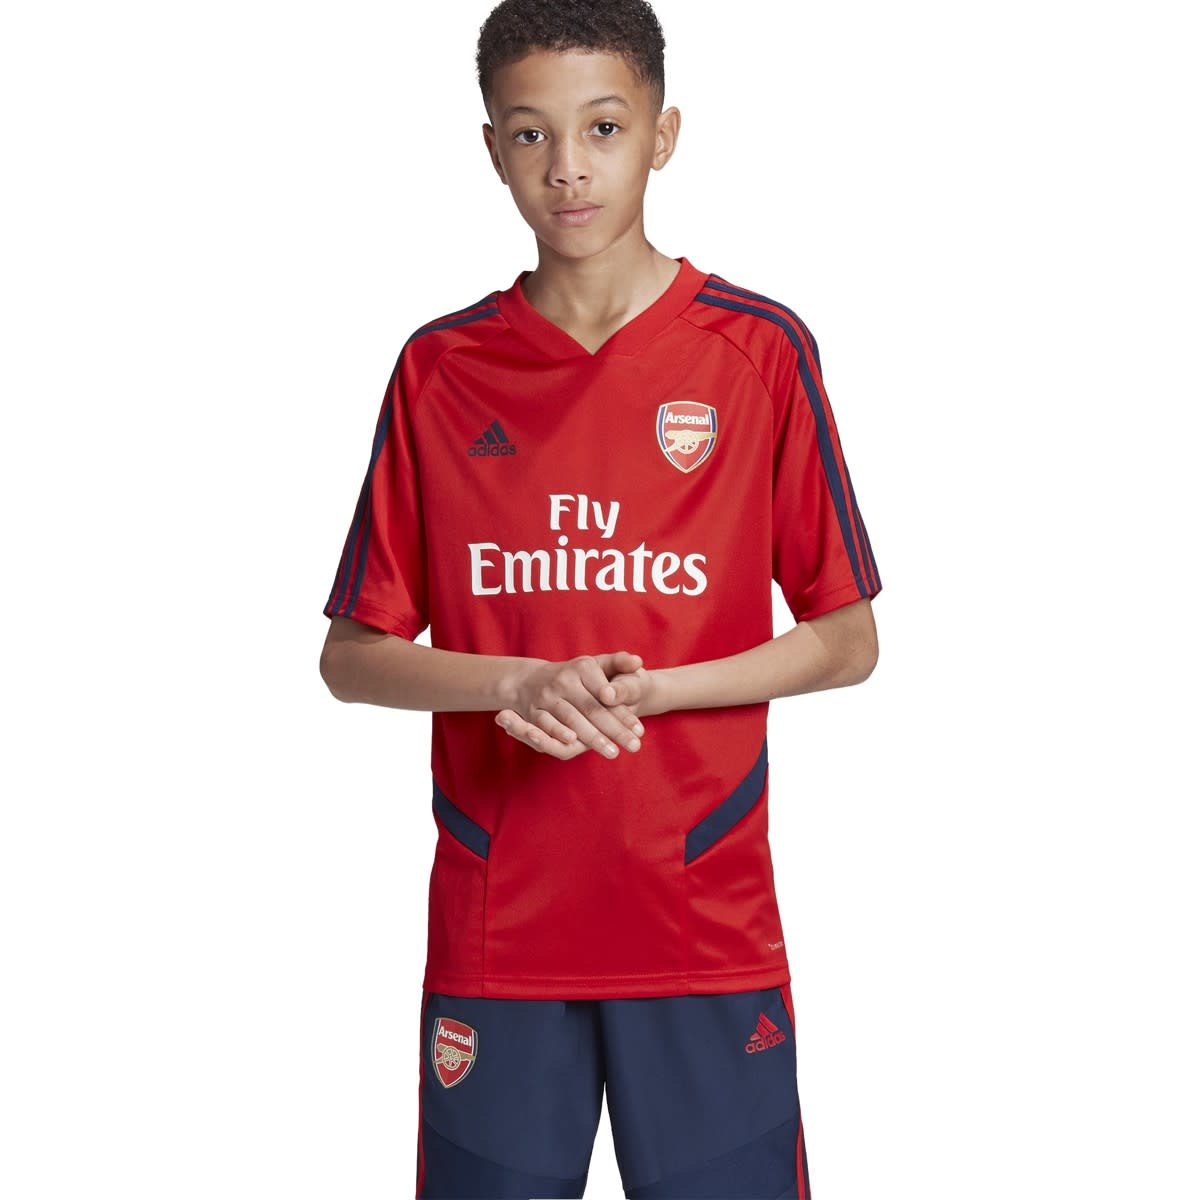 ARSENAL 19/20 TRAINING JERSEY YOUTH - SoccerWorld